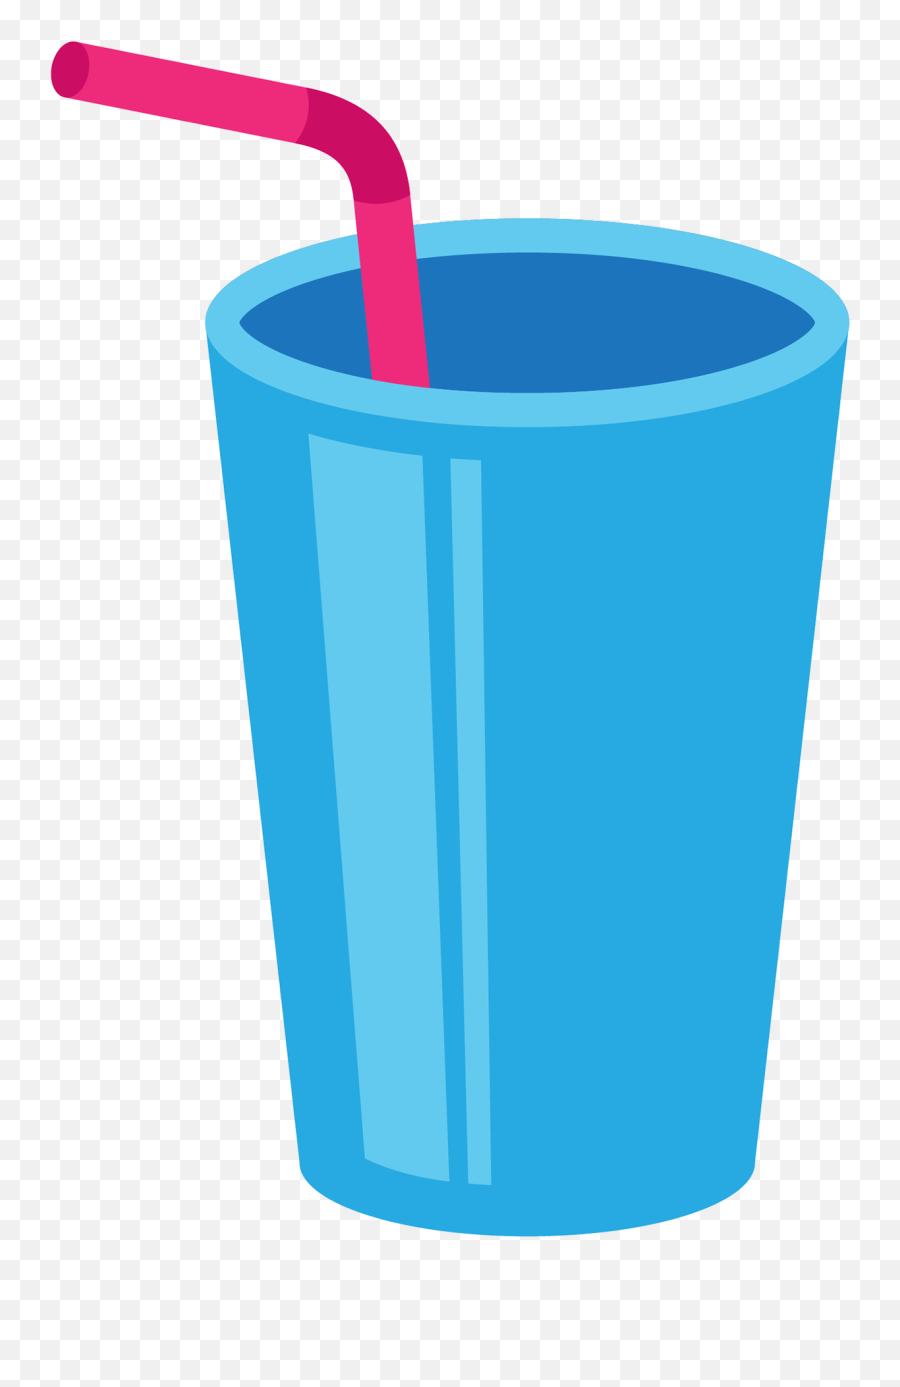 Aphee Messer - Caffeinated Drink Emoji